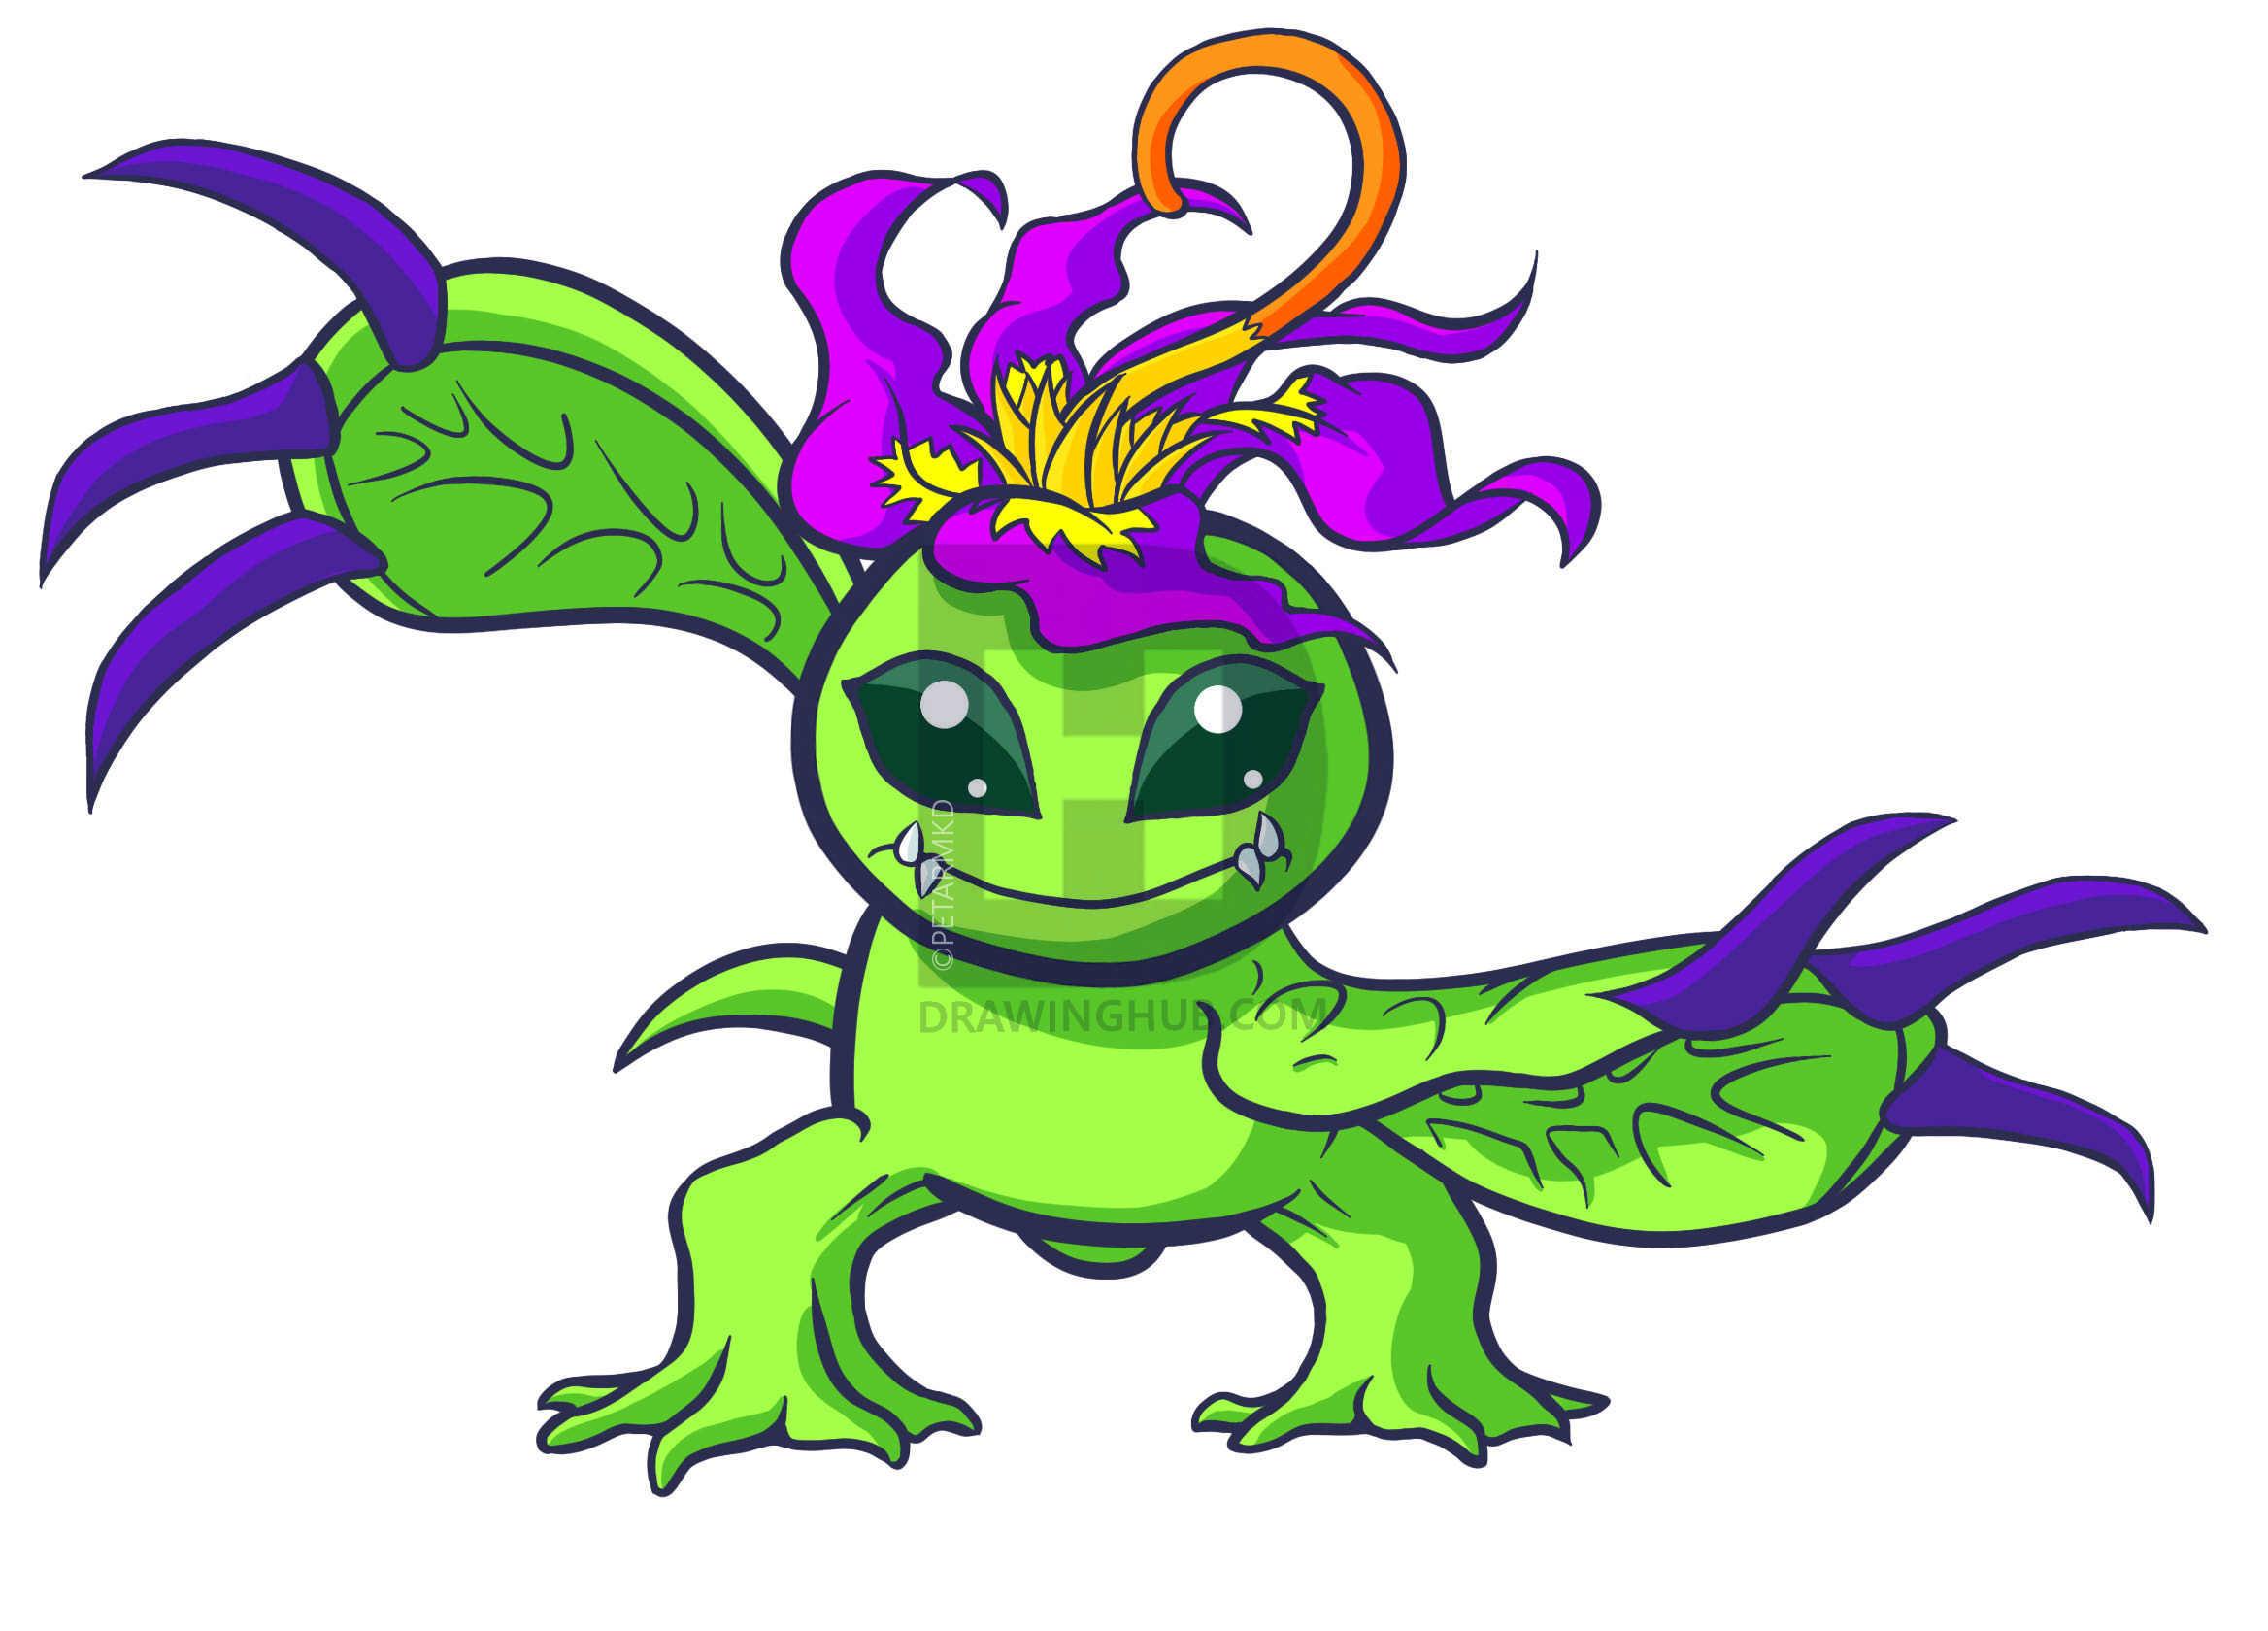 2336x1680 How To Draw Palmon, Palmon, Digimon, Step